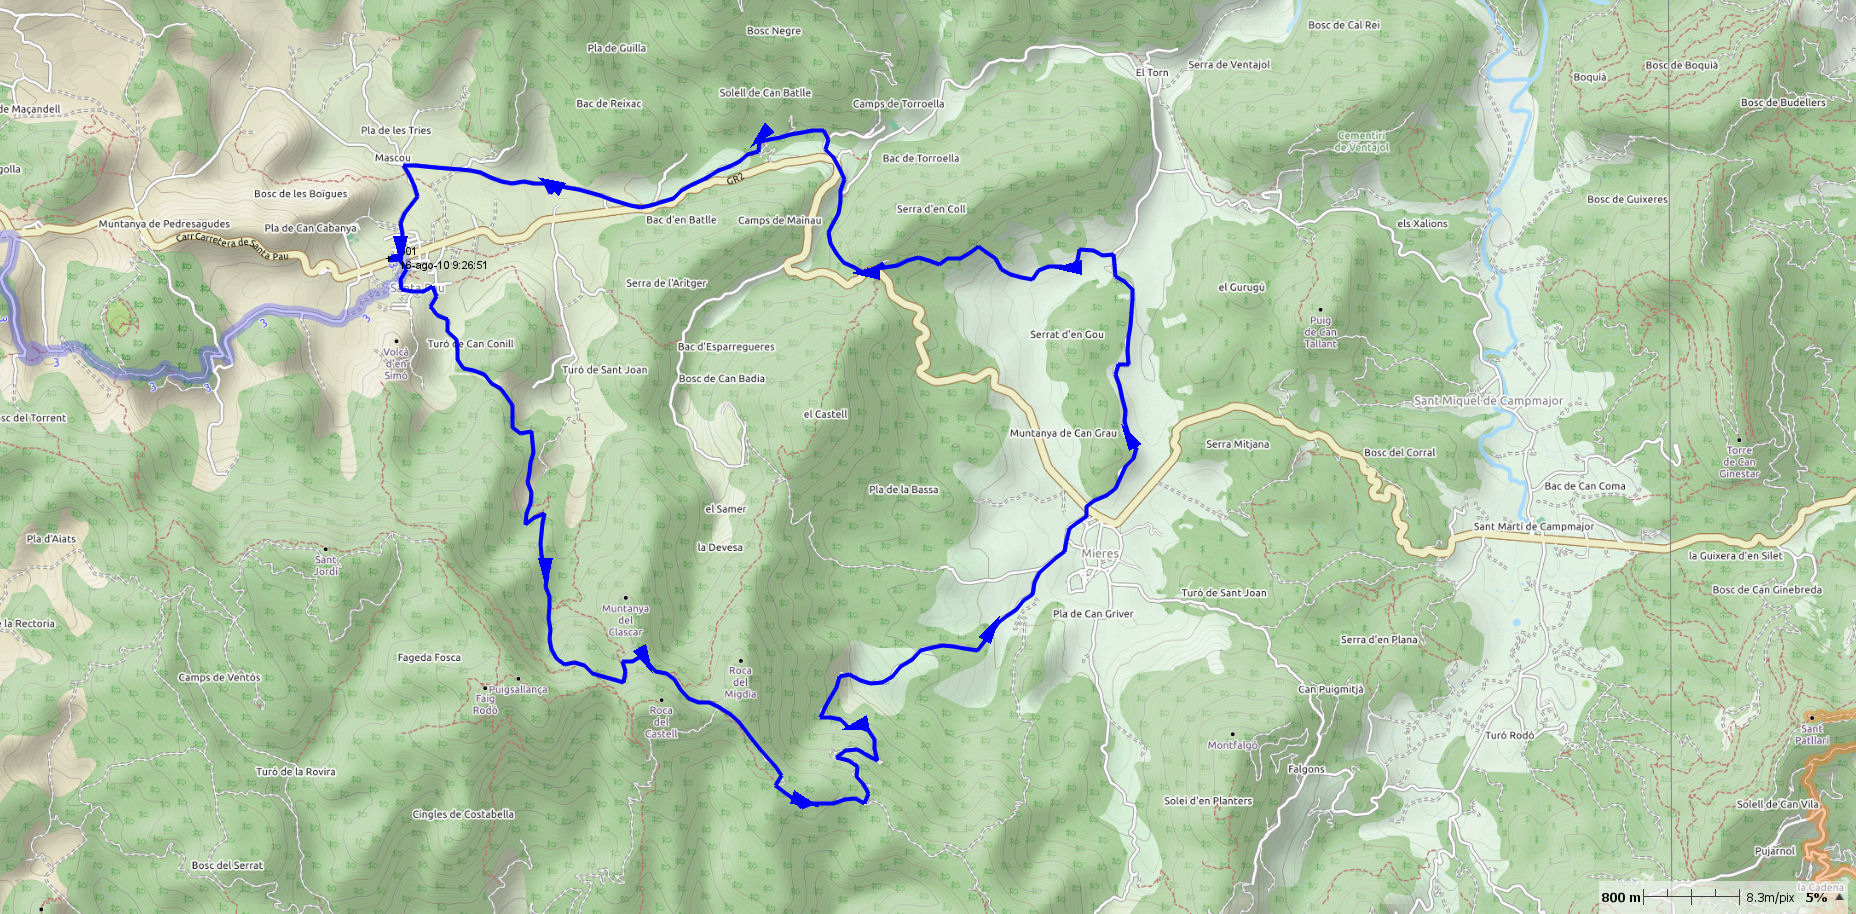 SATA-PAU-FINESTRES-MIERES-MAP